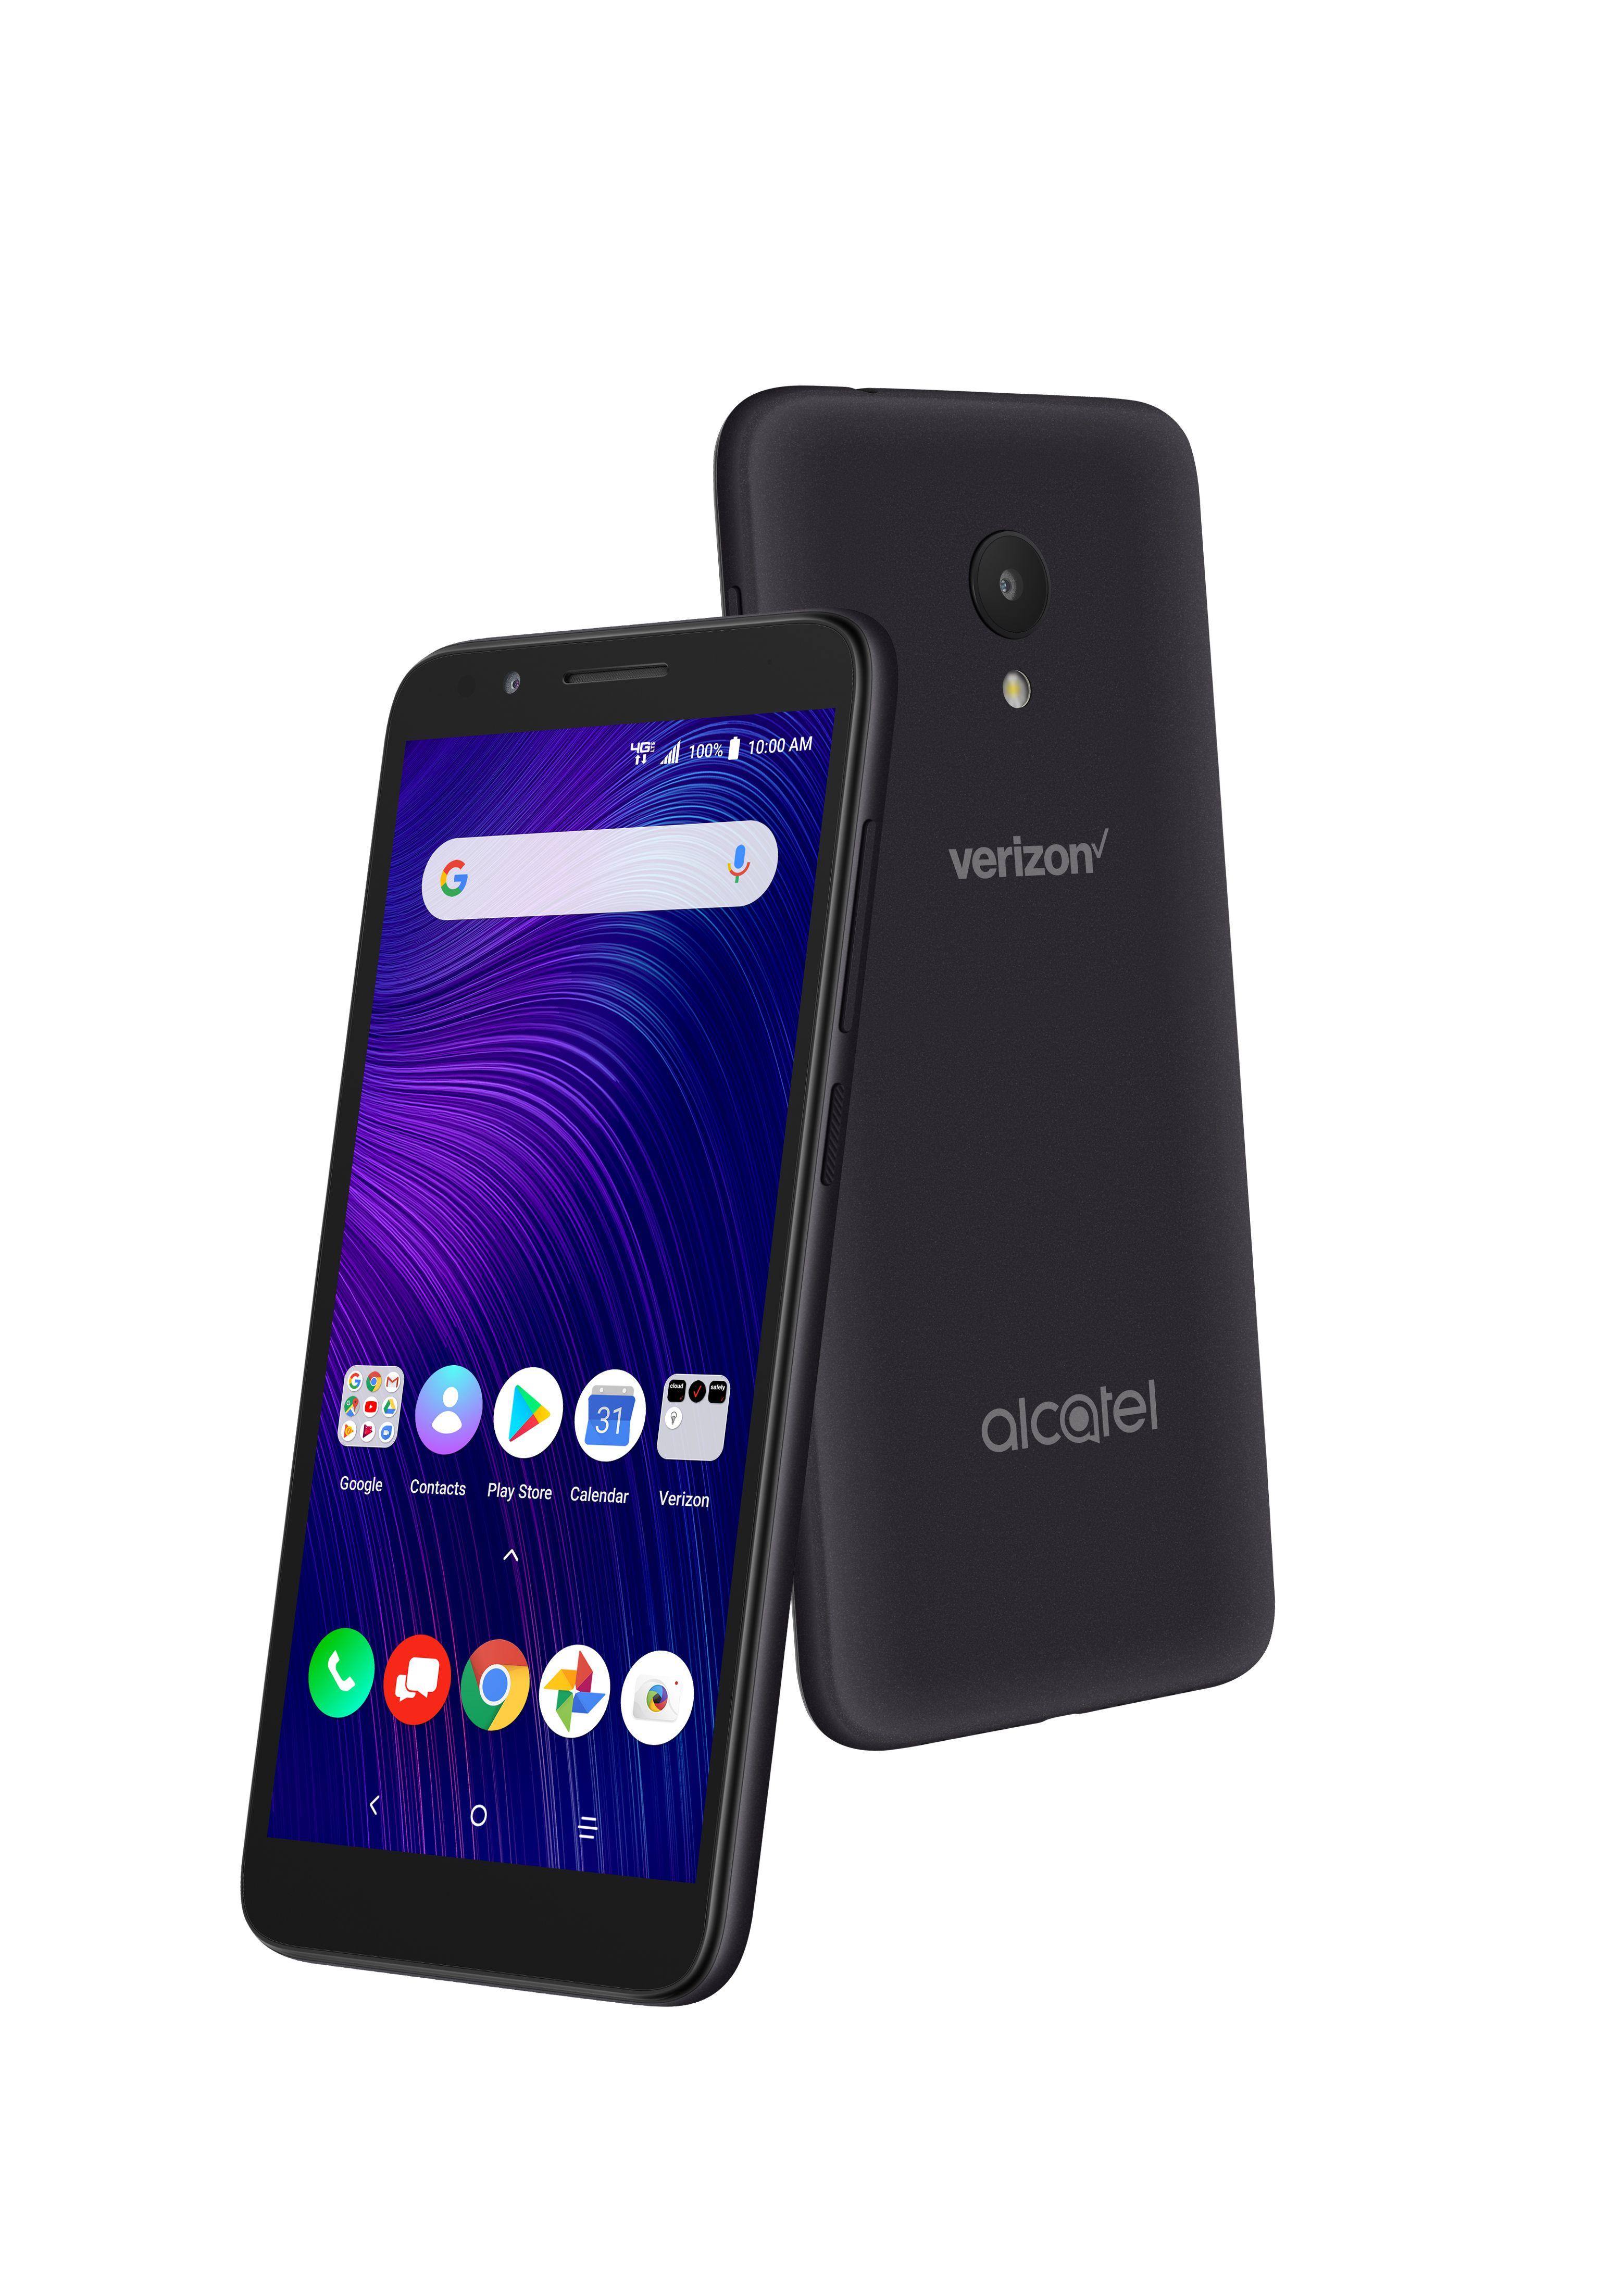 Smartphones For Under 100 Alcatelmobileus Alcatelmobile